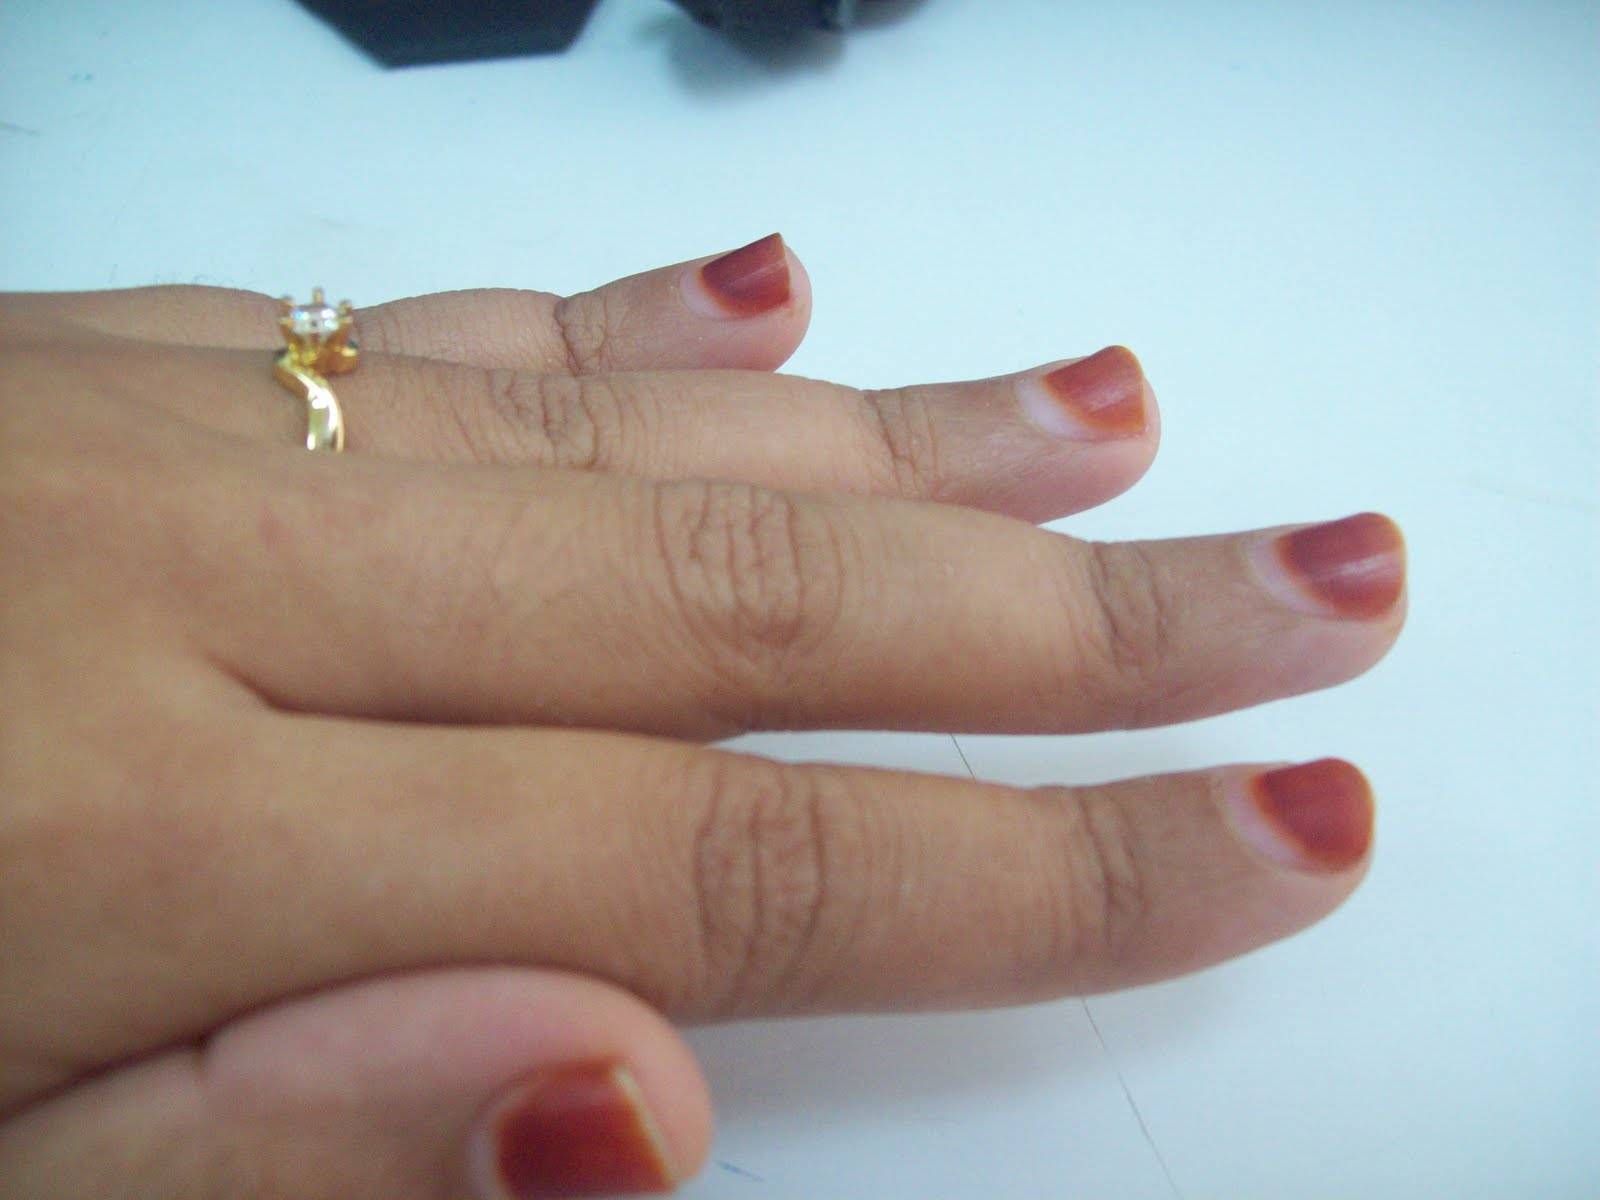 Cerita Erina Review Henna Tangan Amp Kaki